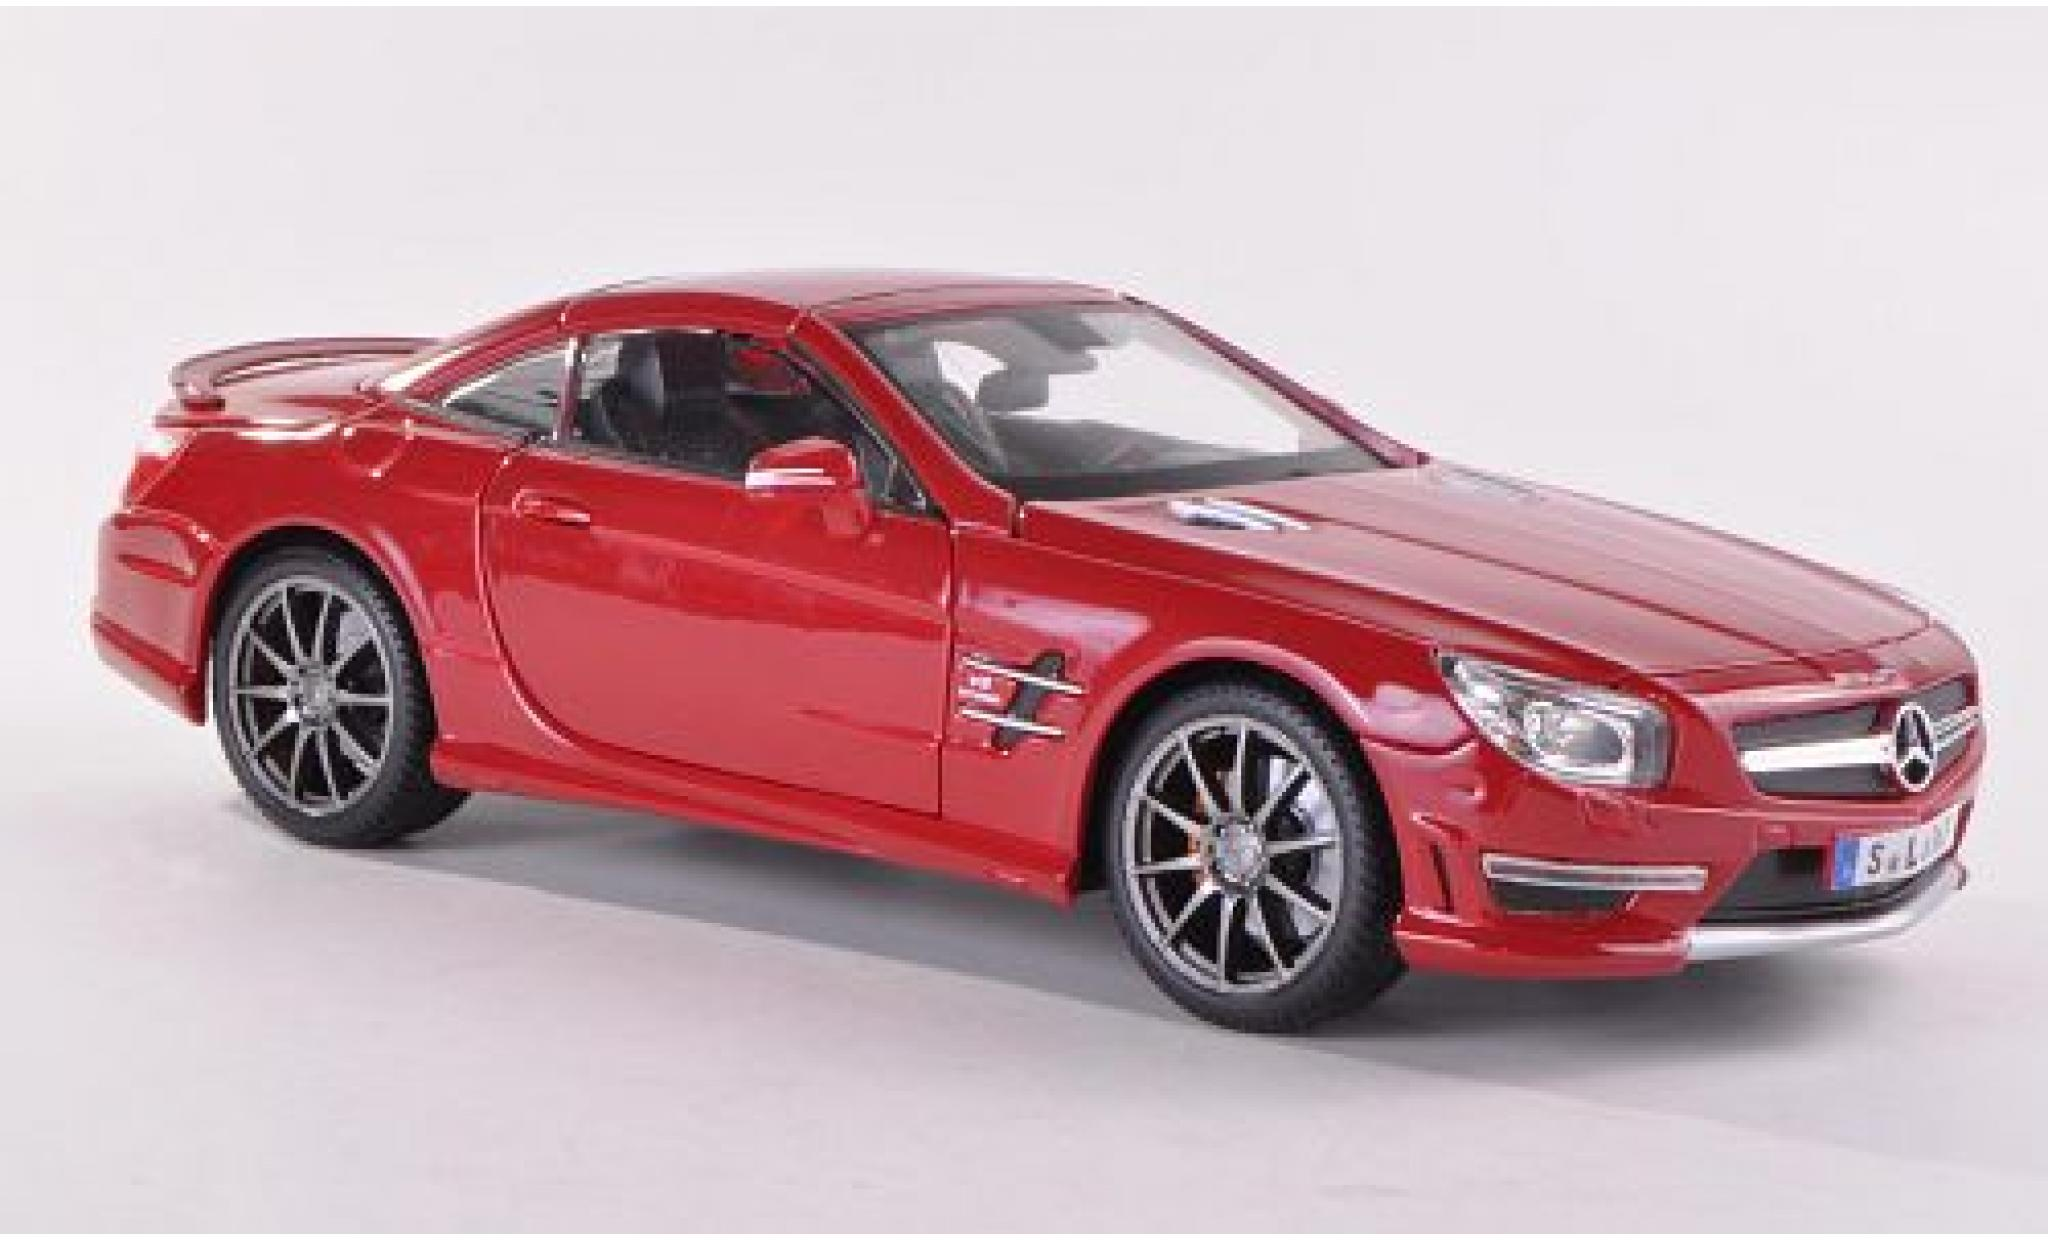 Mercedes Classe SL 1/18 Maisto SL 63 AMG (R231) rouge 2012 Verdeck fermé